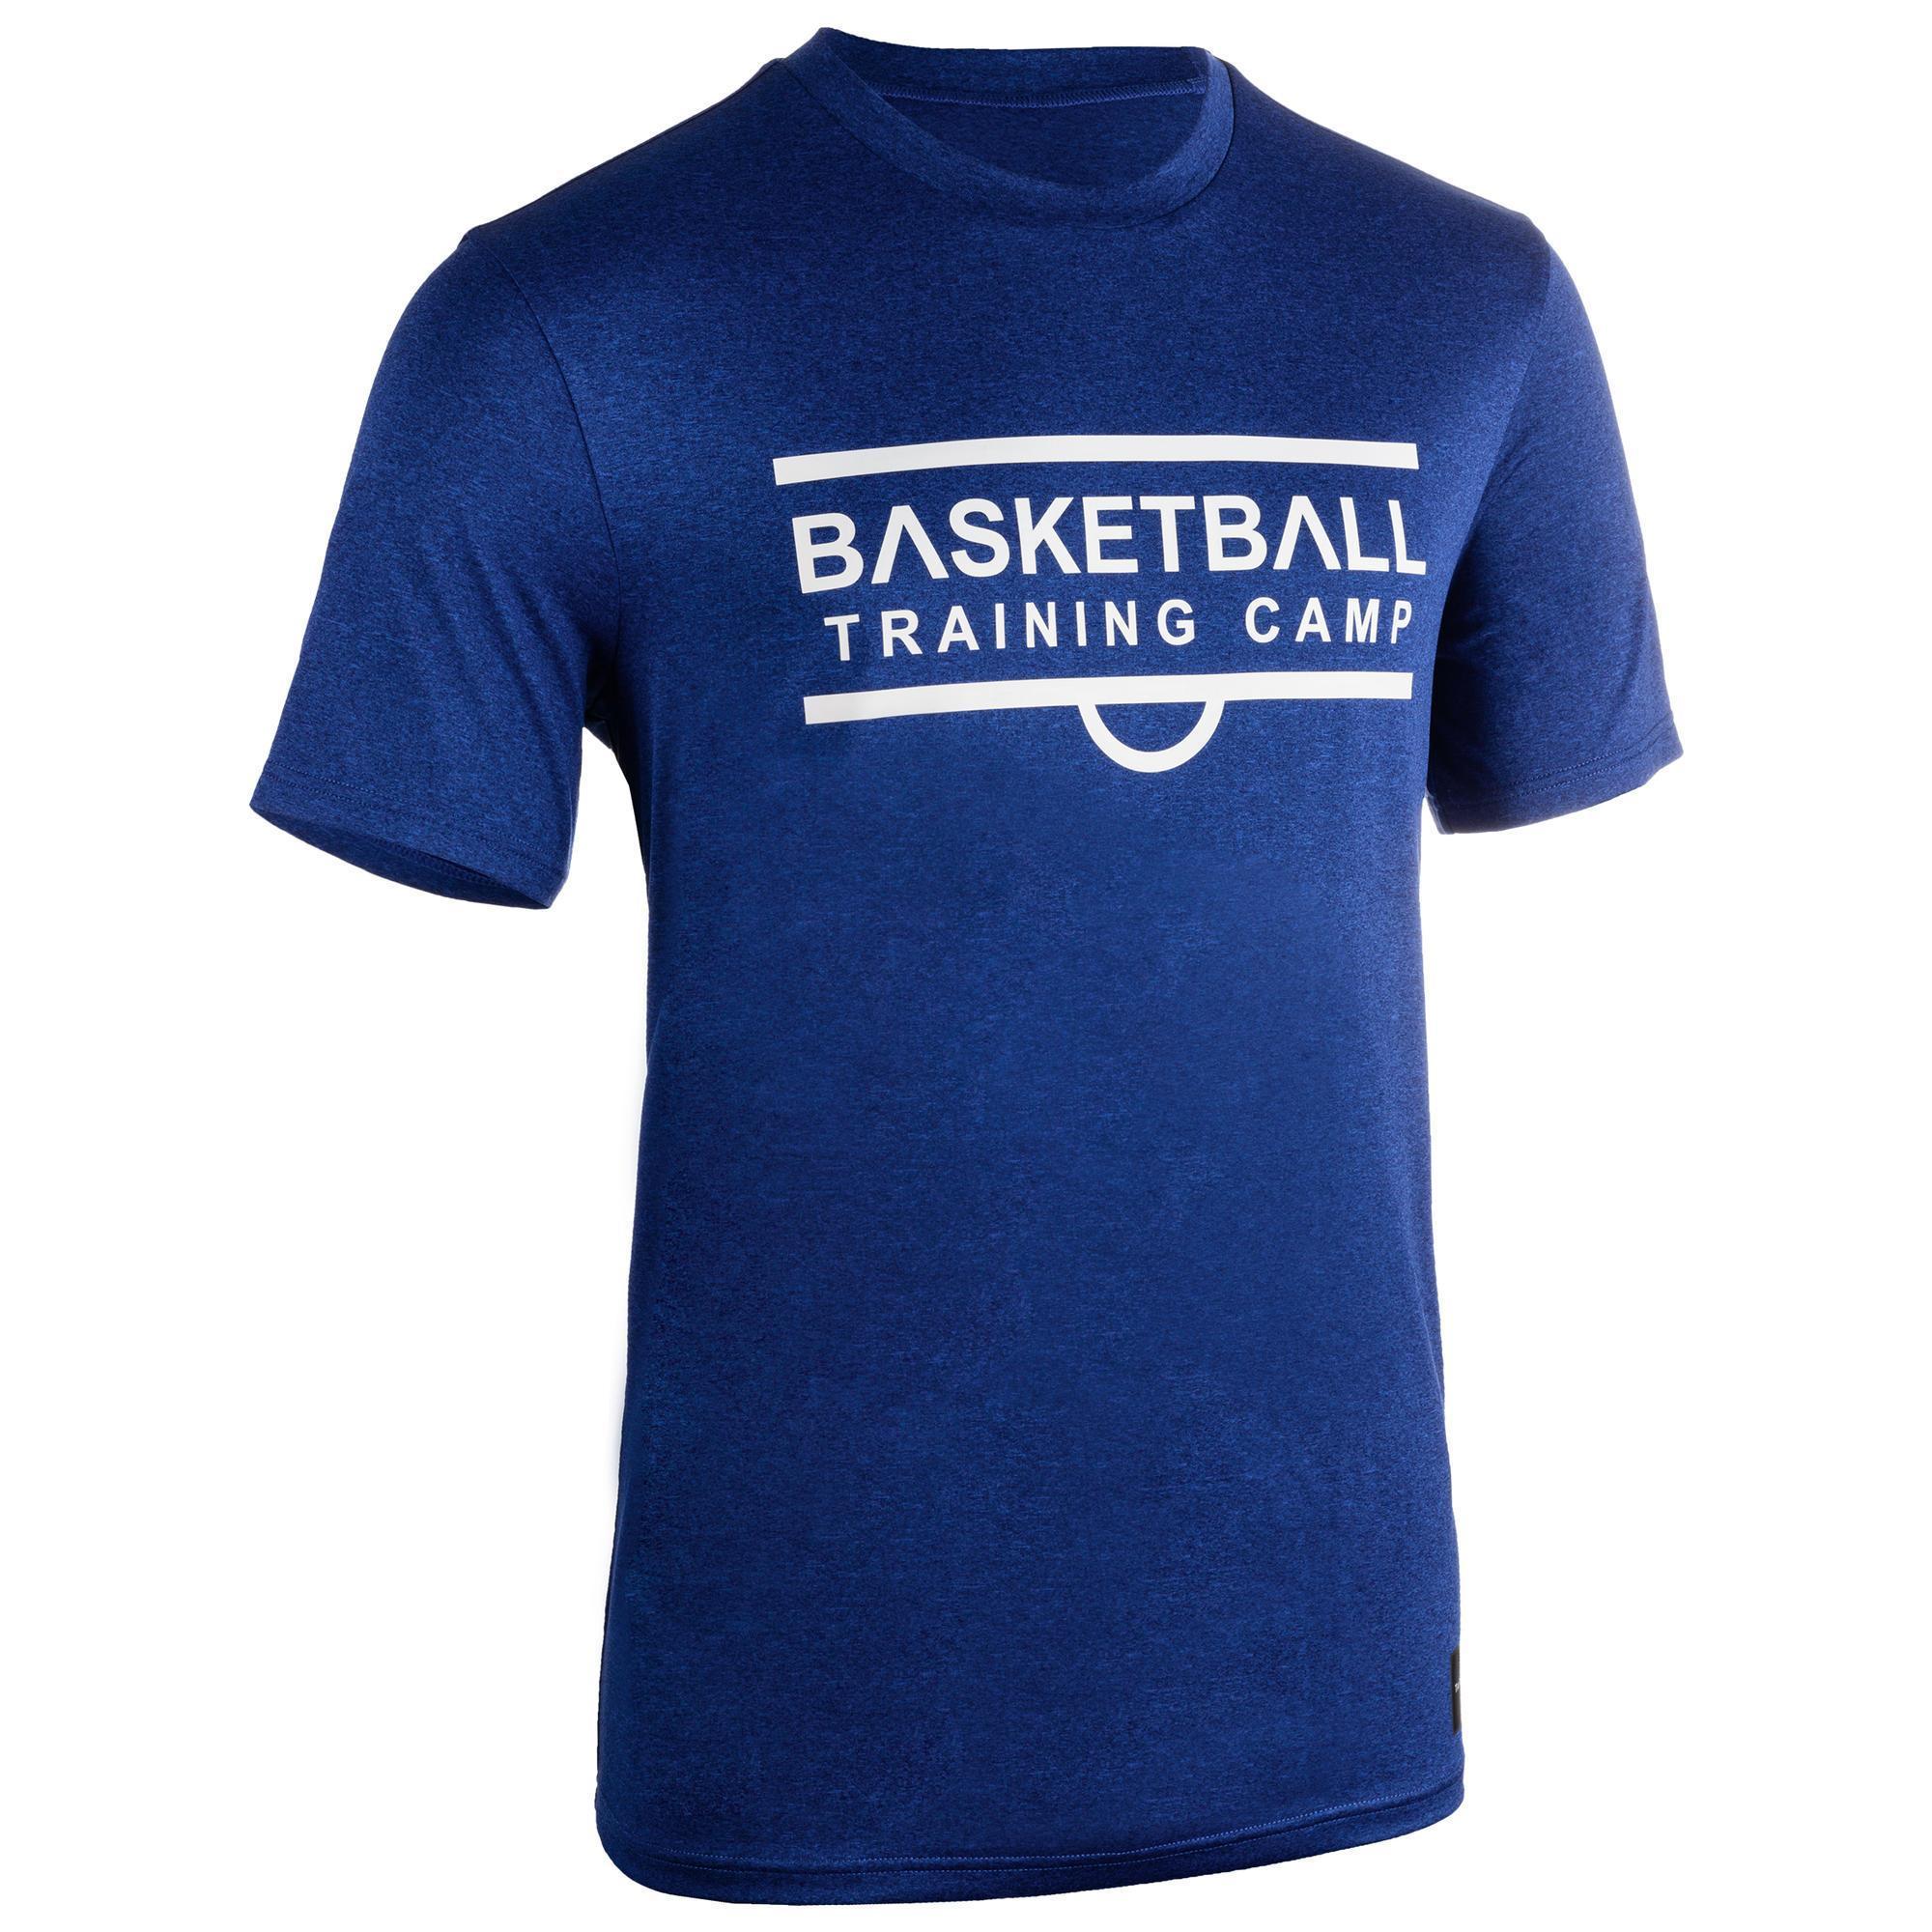 Basketballtrikot TS500 Herren marineblau Shoot | Sportbekleidung > Trikots > Basketballtrikots | Blau | Tarmak